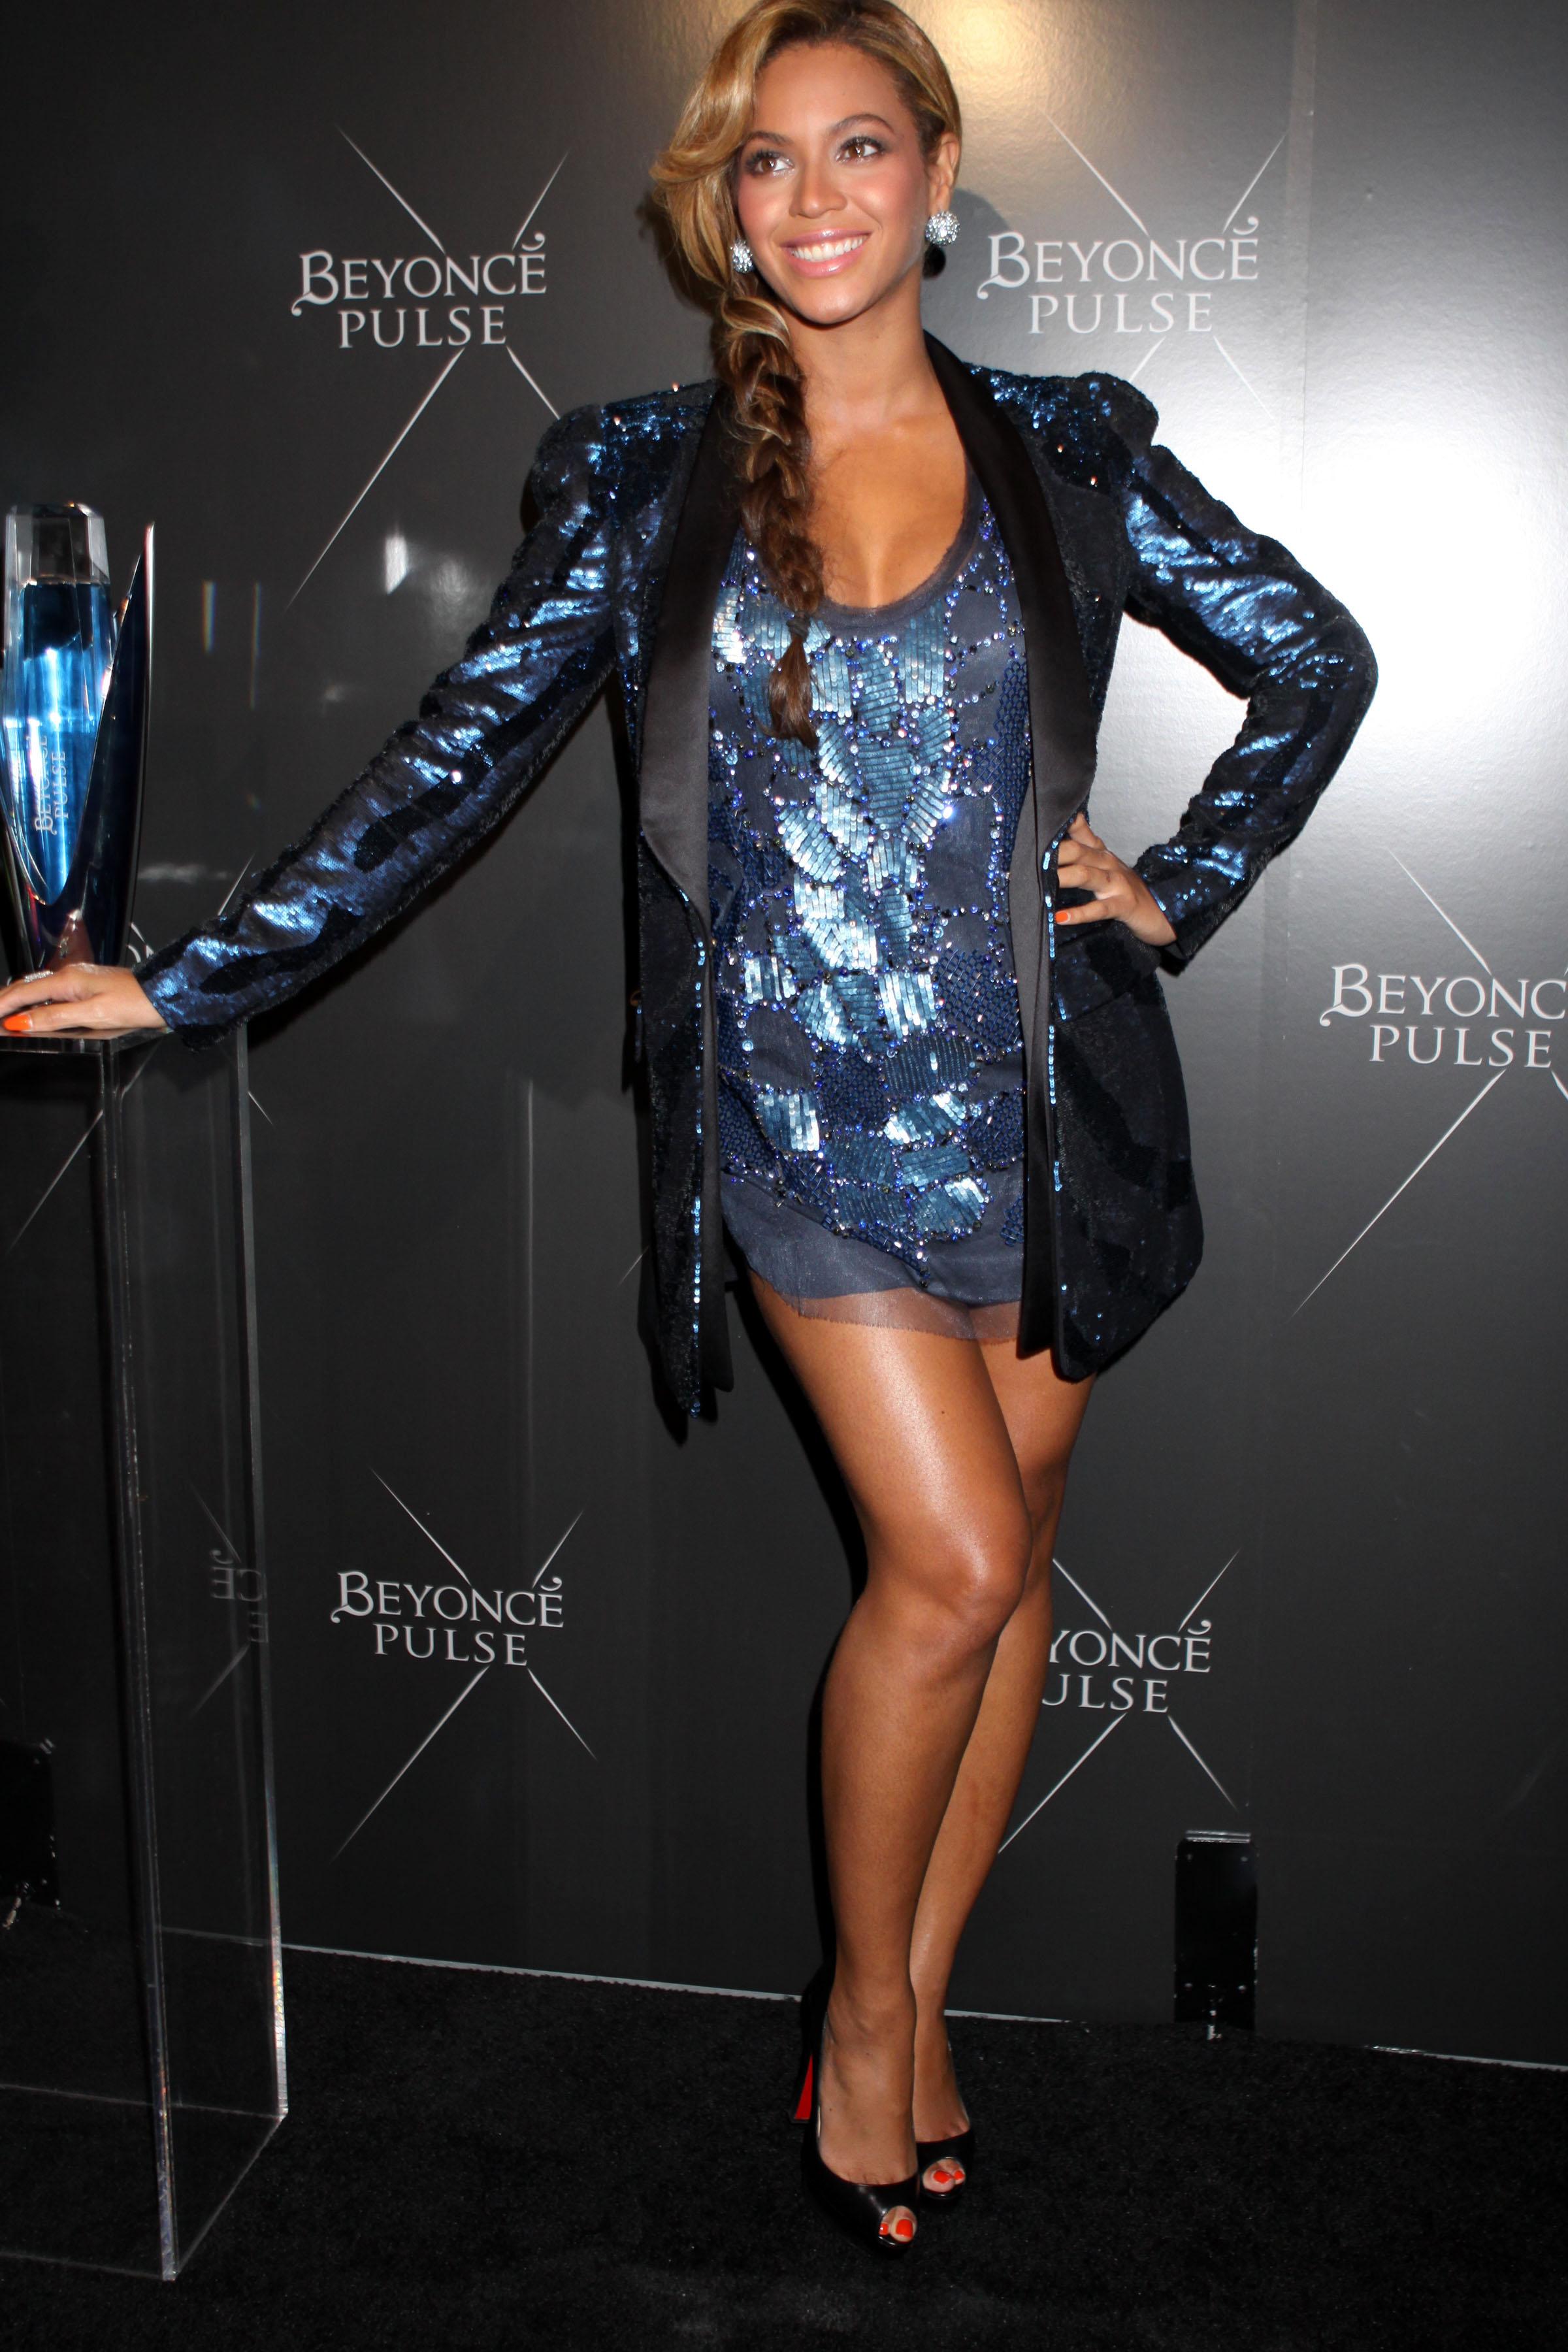 FP 7916606 Beyonce Pulse NYC 21 24